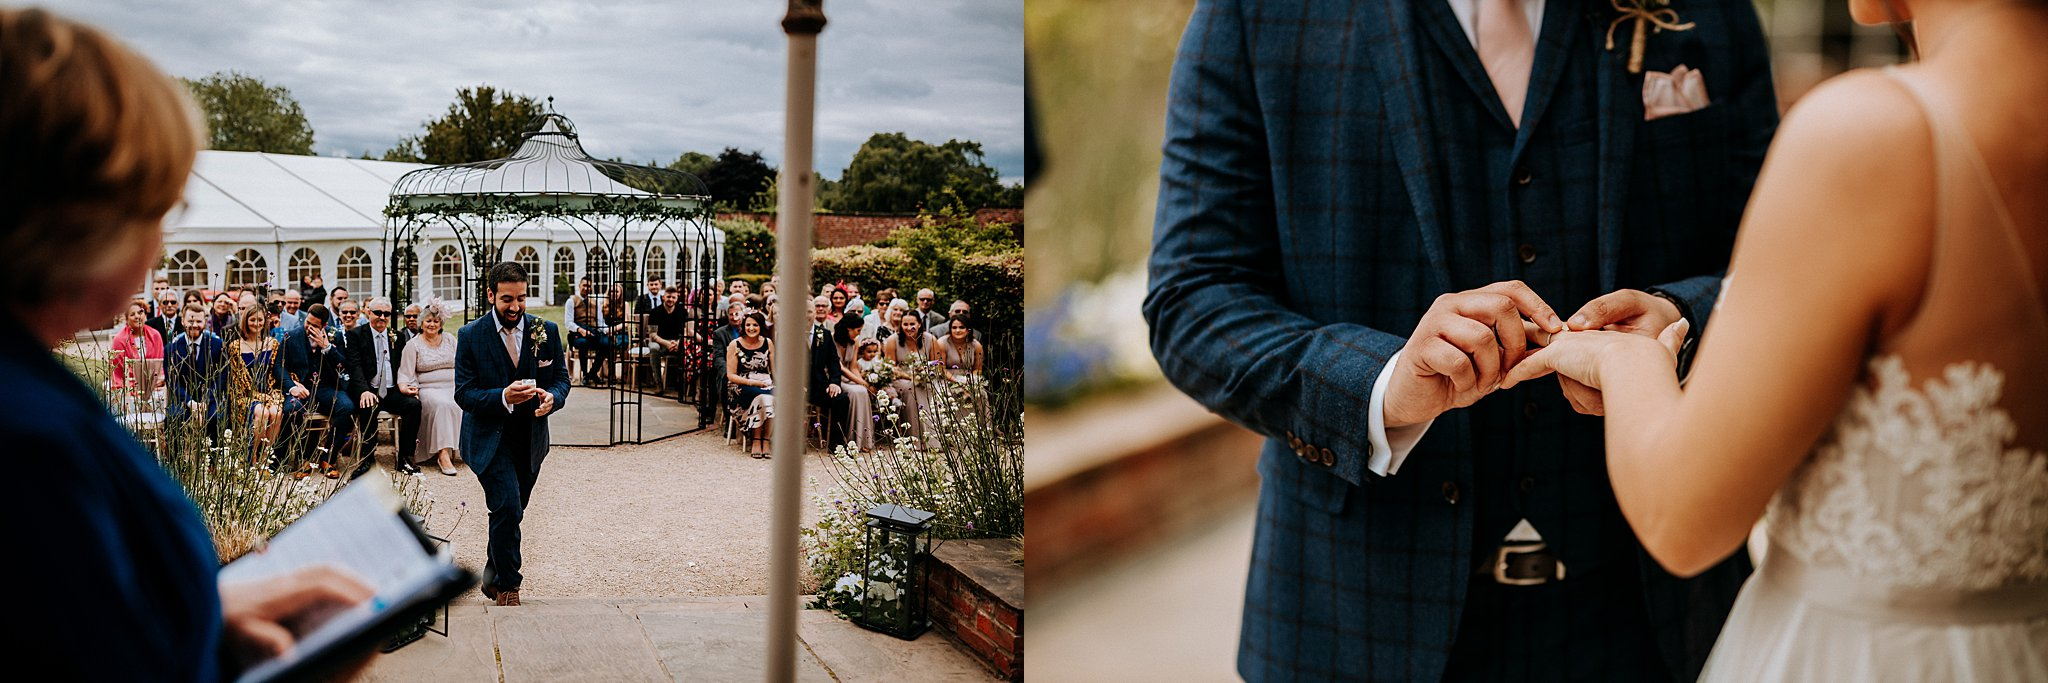 Documentary Wedding Photography Midlands